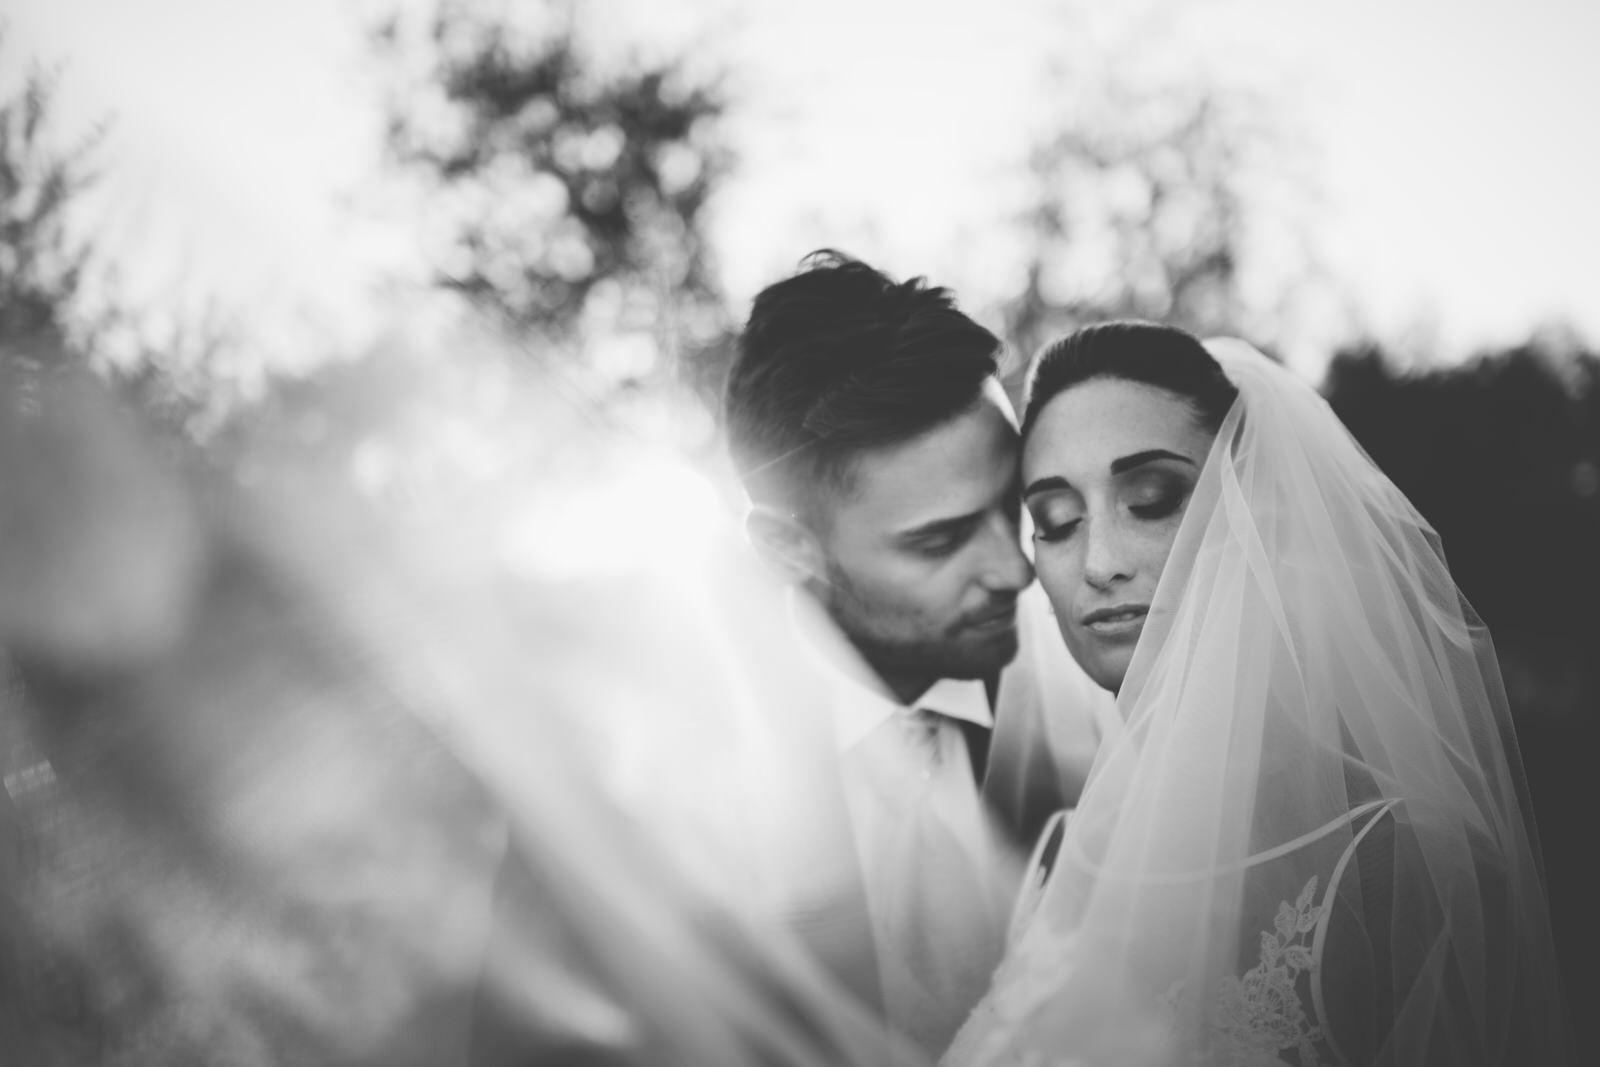 wedding photographer in italy-venice-tuscany-florence-amalfi coast-como lake-villa del balbianello-siena-amalfi-ravello-belmond-villa cimbrone47